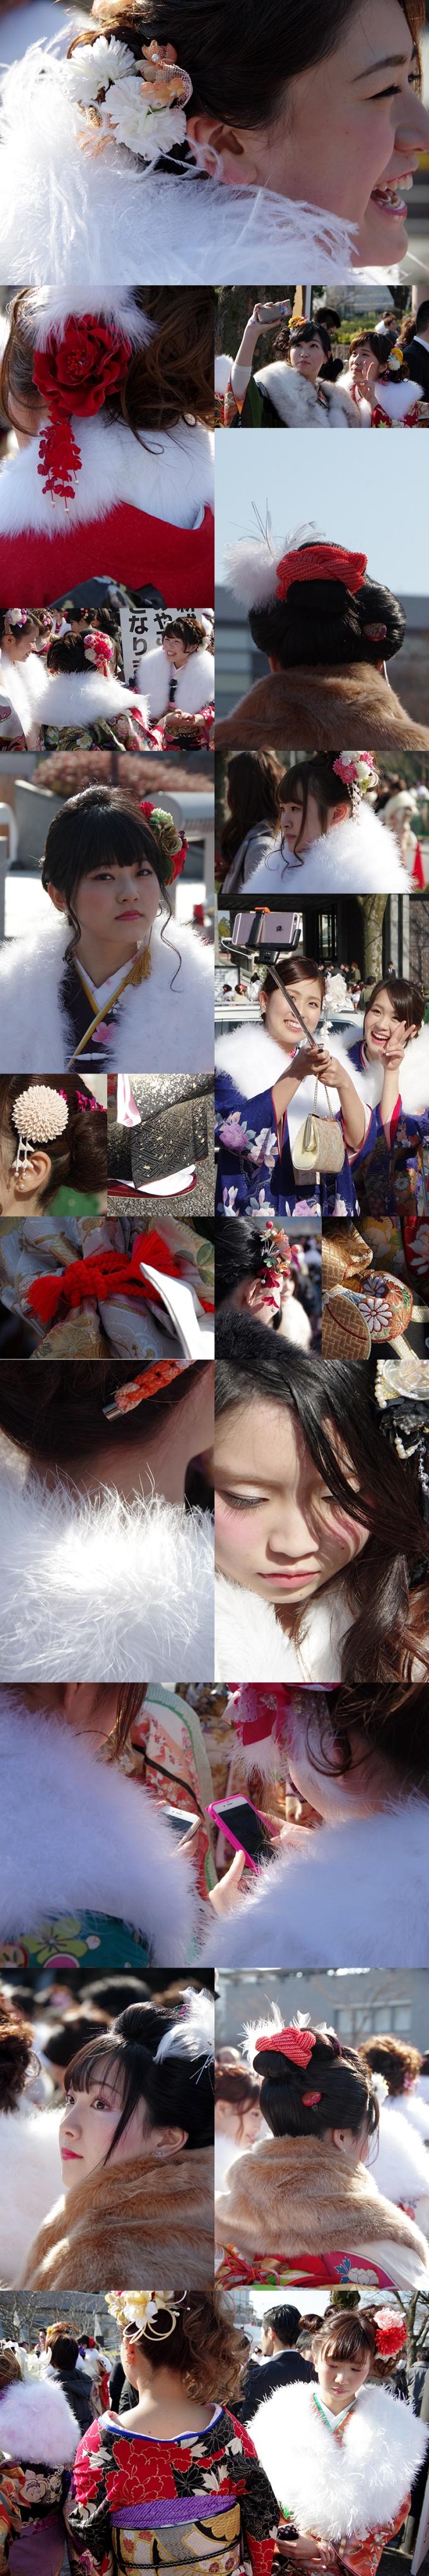 WP_seijin_shiki_tapis_6